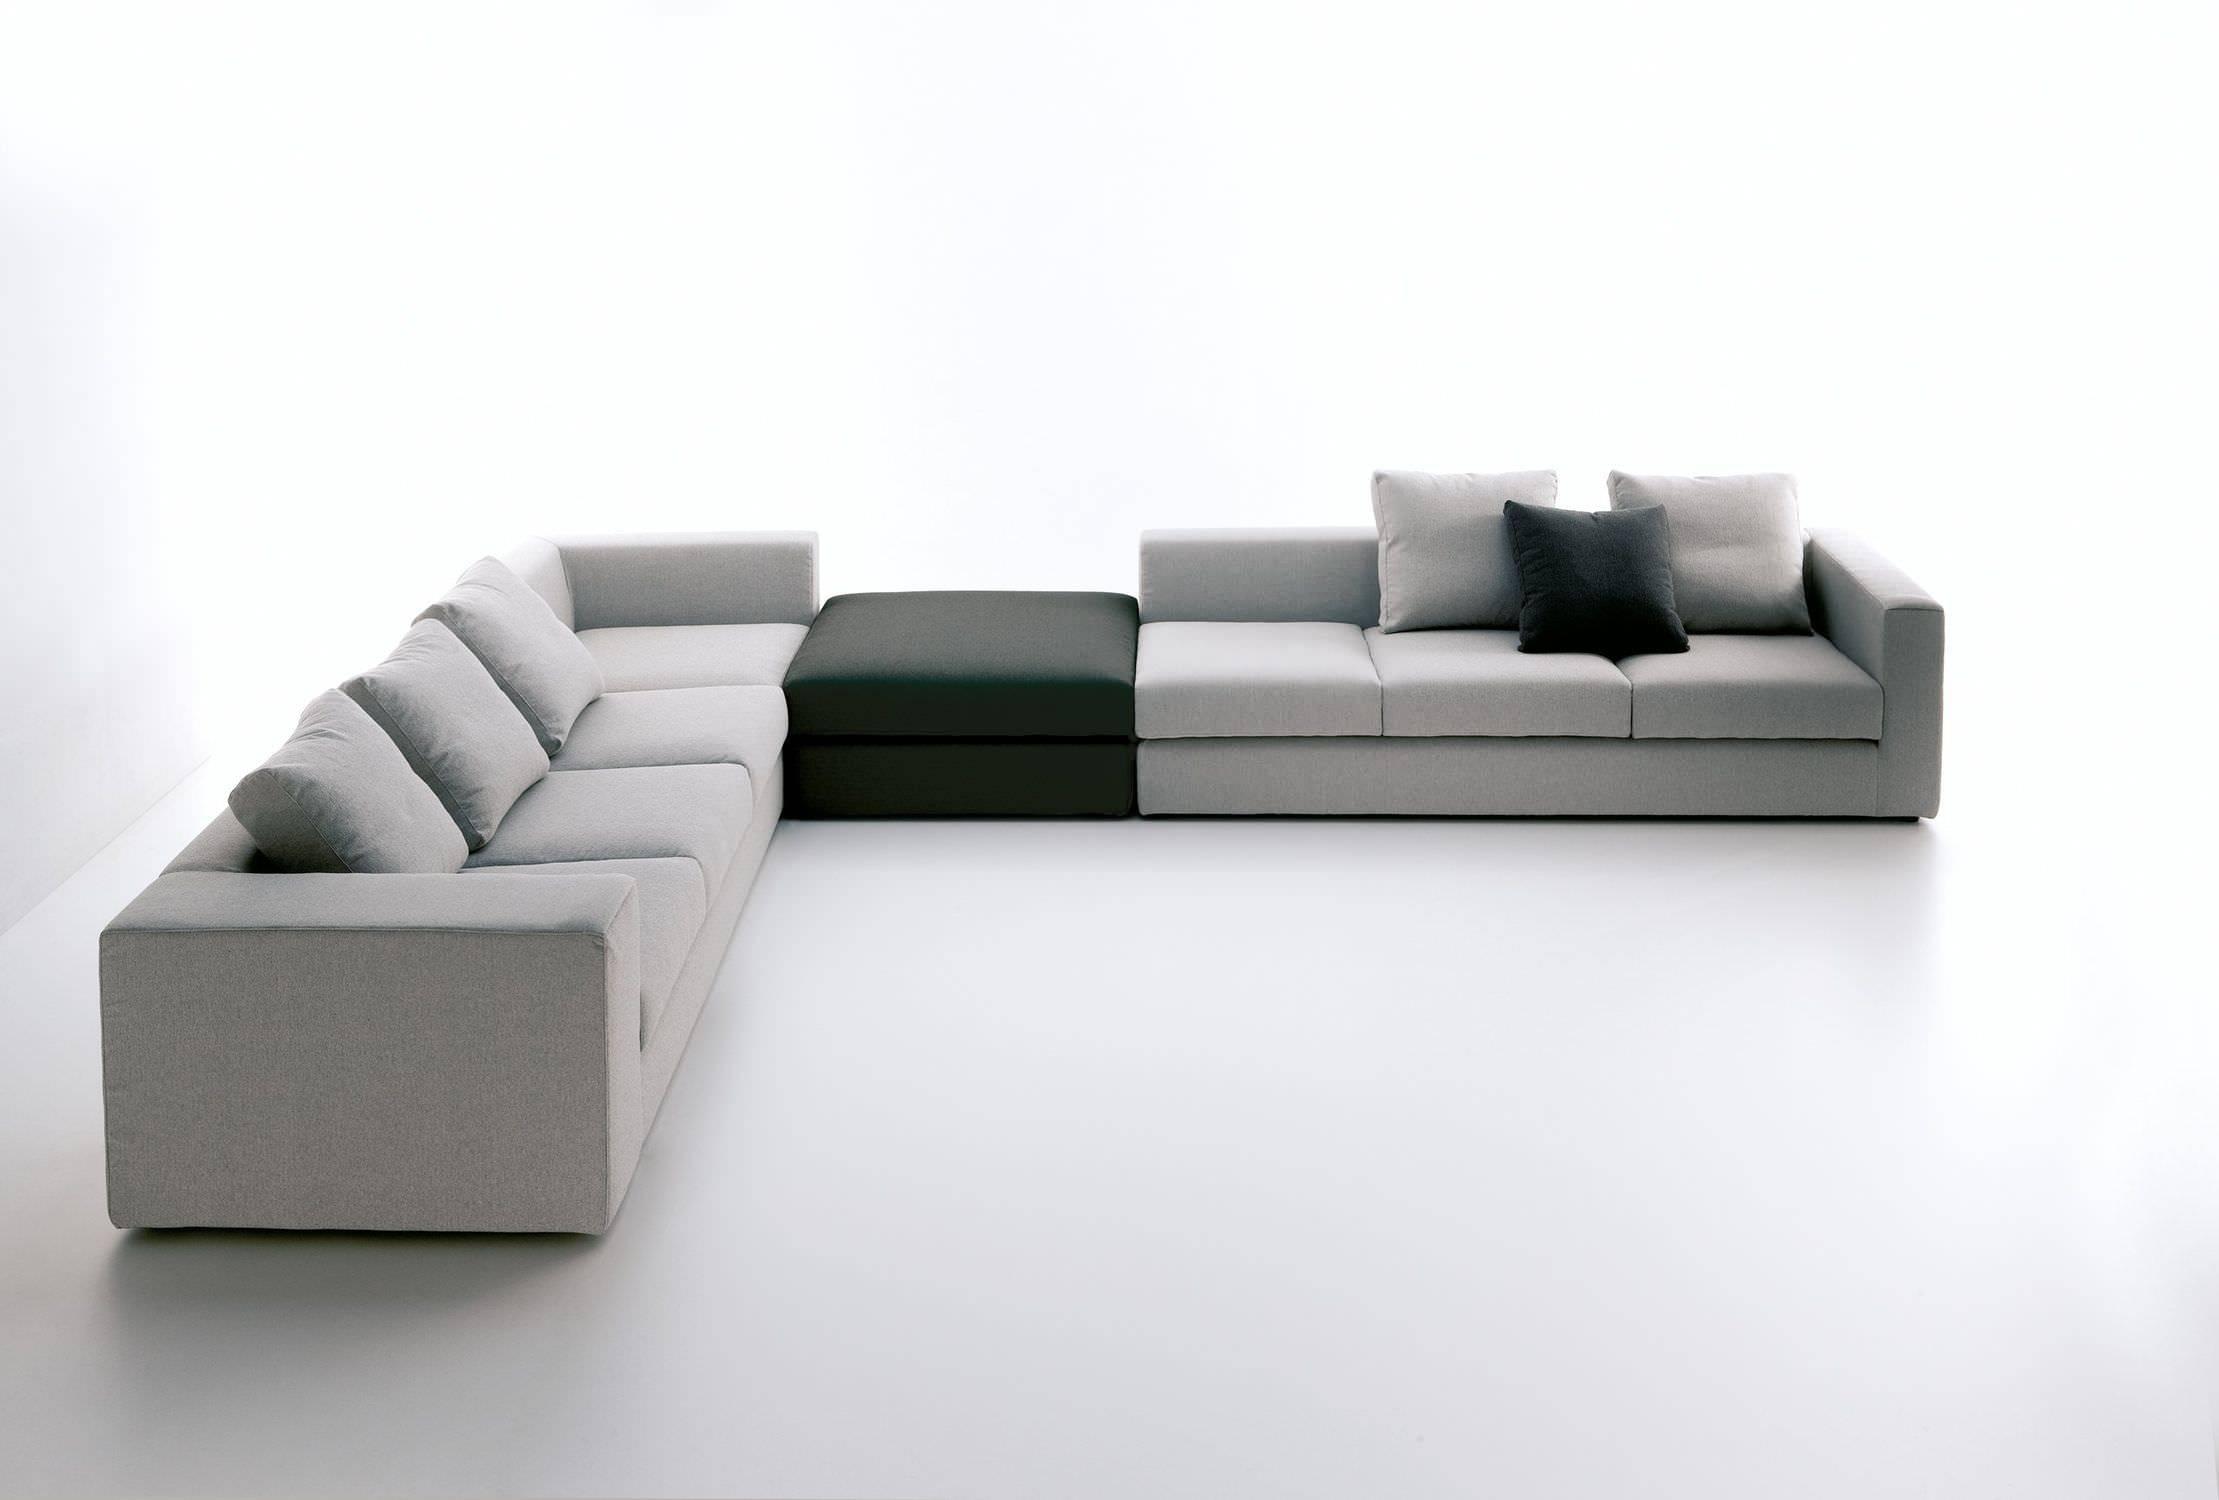 Modular Sofa / Contemporary / Cotton / Leather - Berrystudio within Modular Sofas (Image 10 of 15)